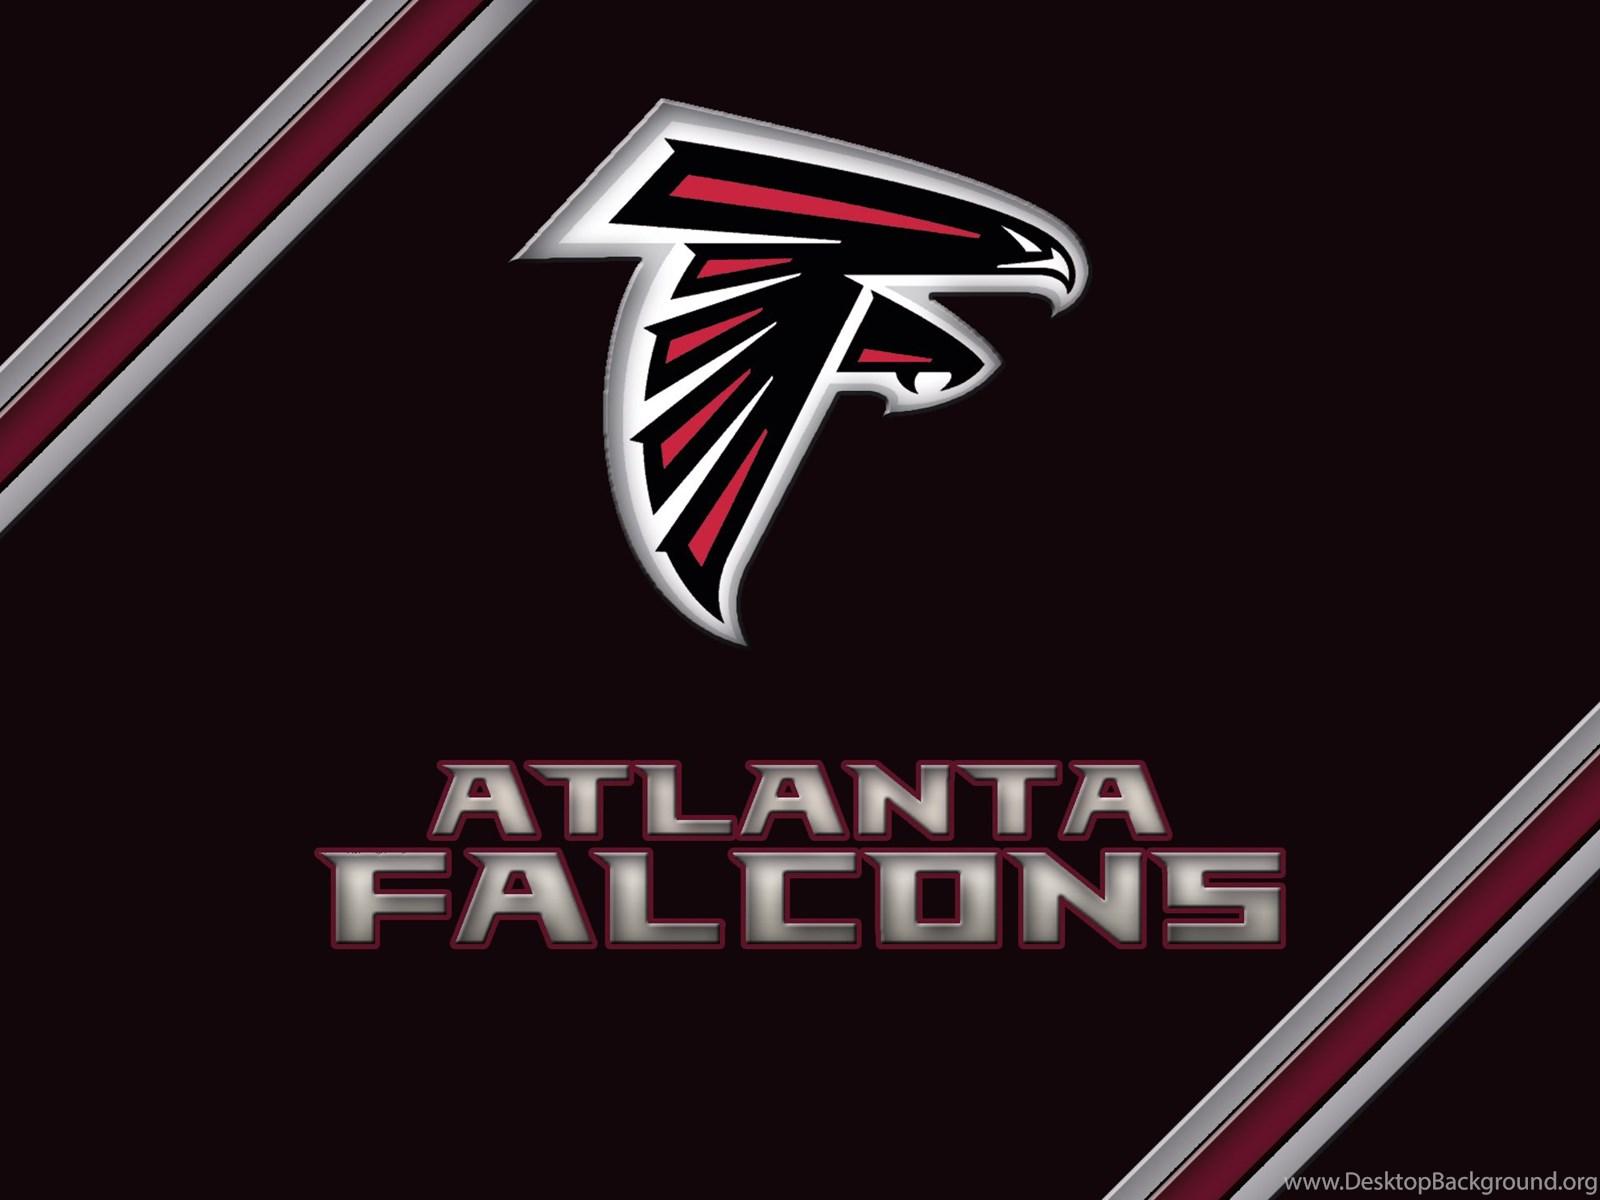 Atlanta Falcons Hd Wallpapers: HD Atlanta Falcons Backgrounds Desktop Background